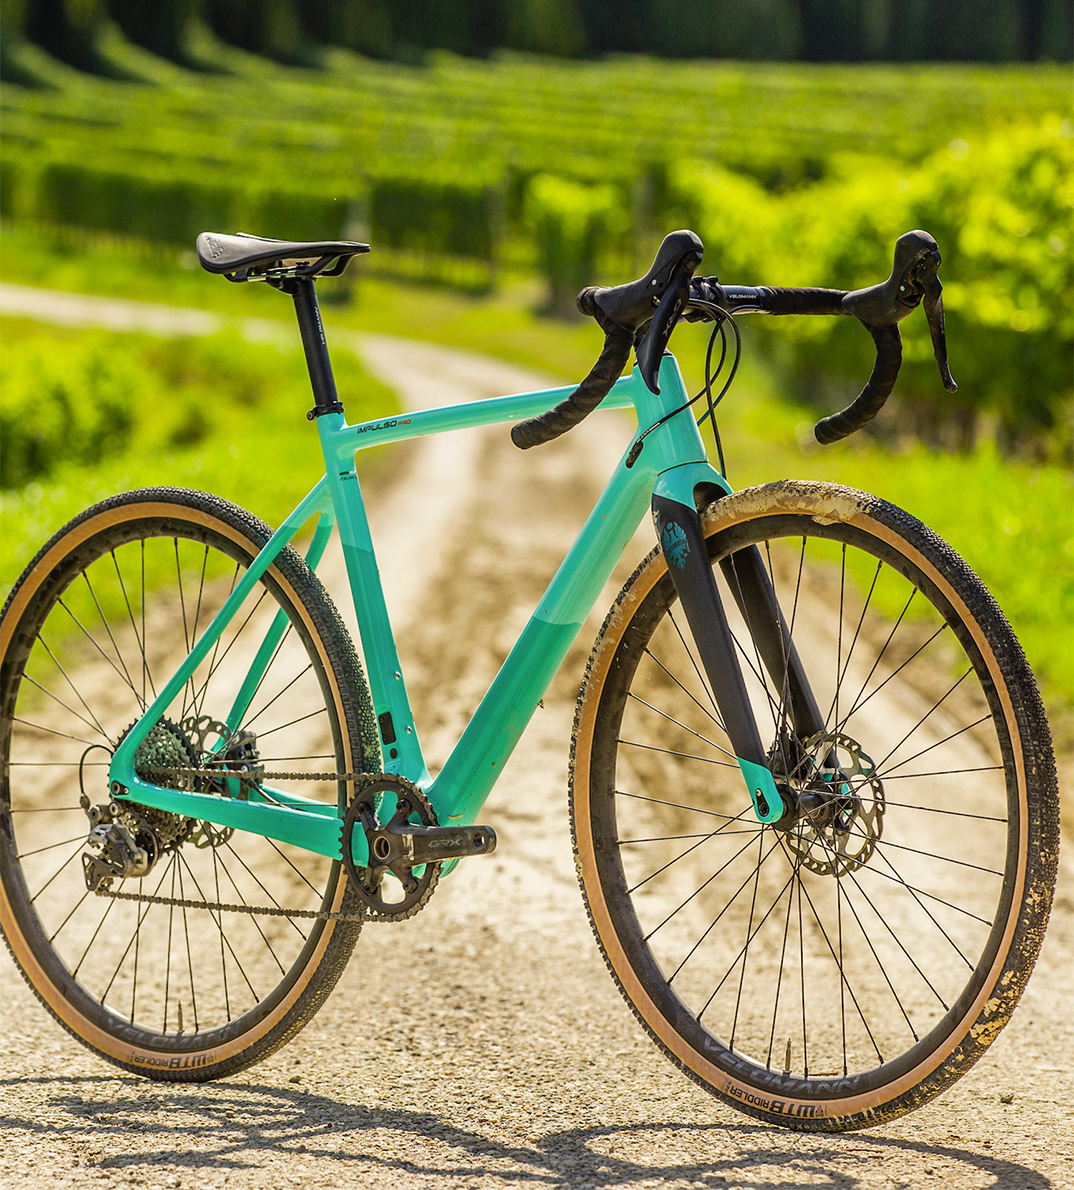 10a-Tornanti_cc-Bianchi-Gravel-Impulso-Pro-20210802-162041-0930F